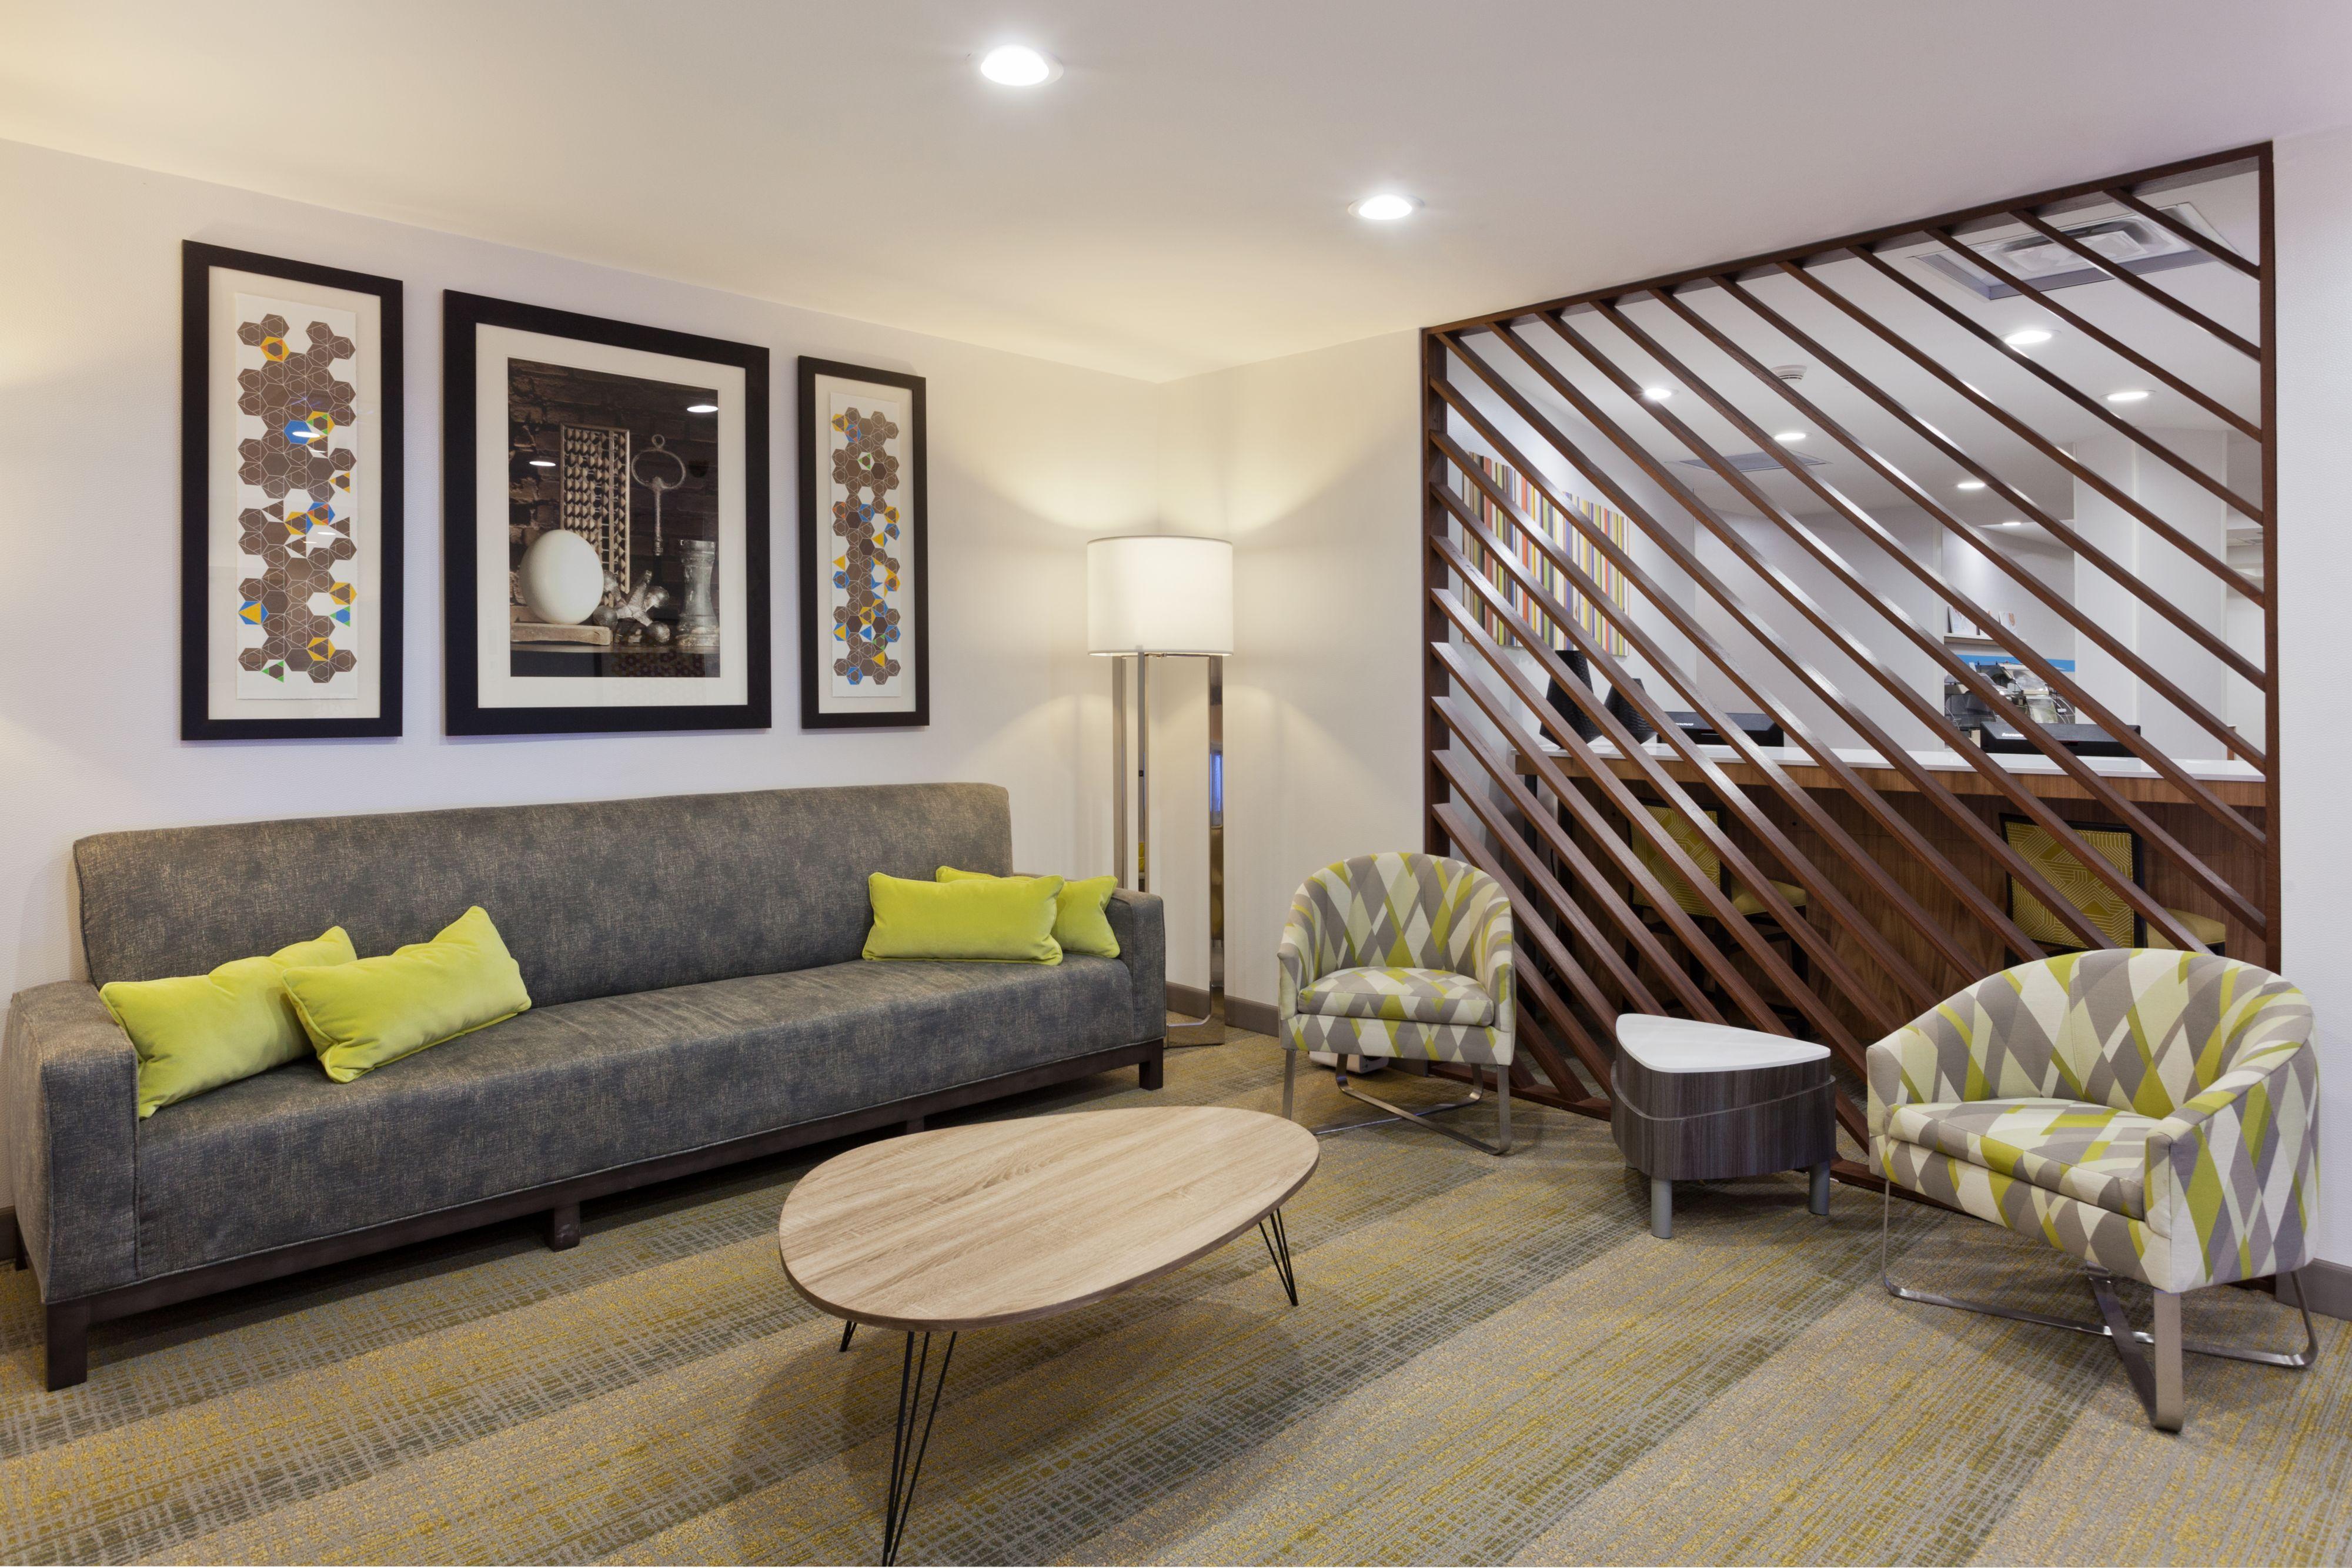 Holiday Inn Express Phenix City-Ft.Benning Area image 4